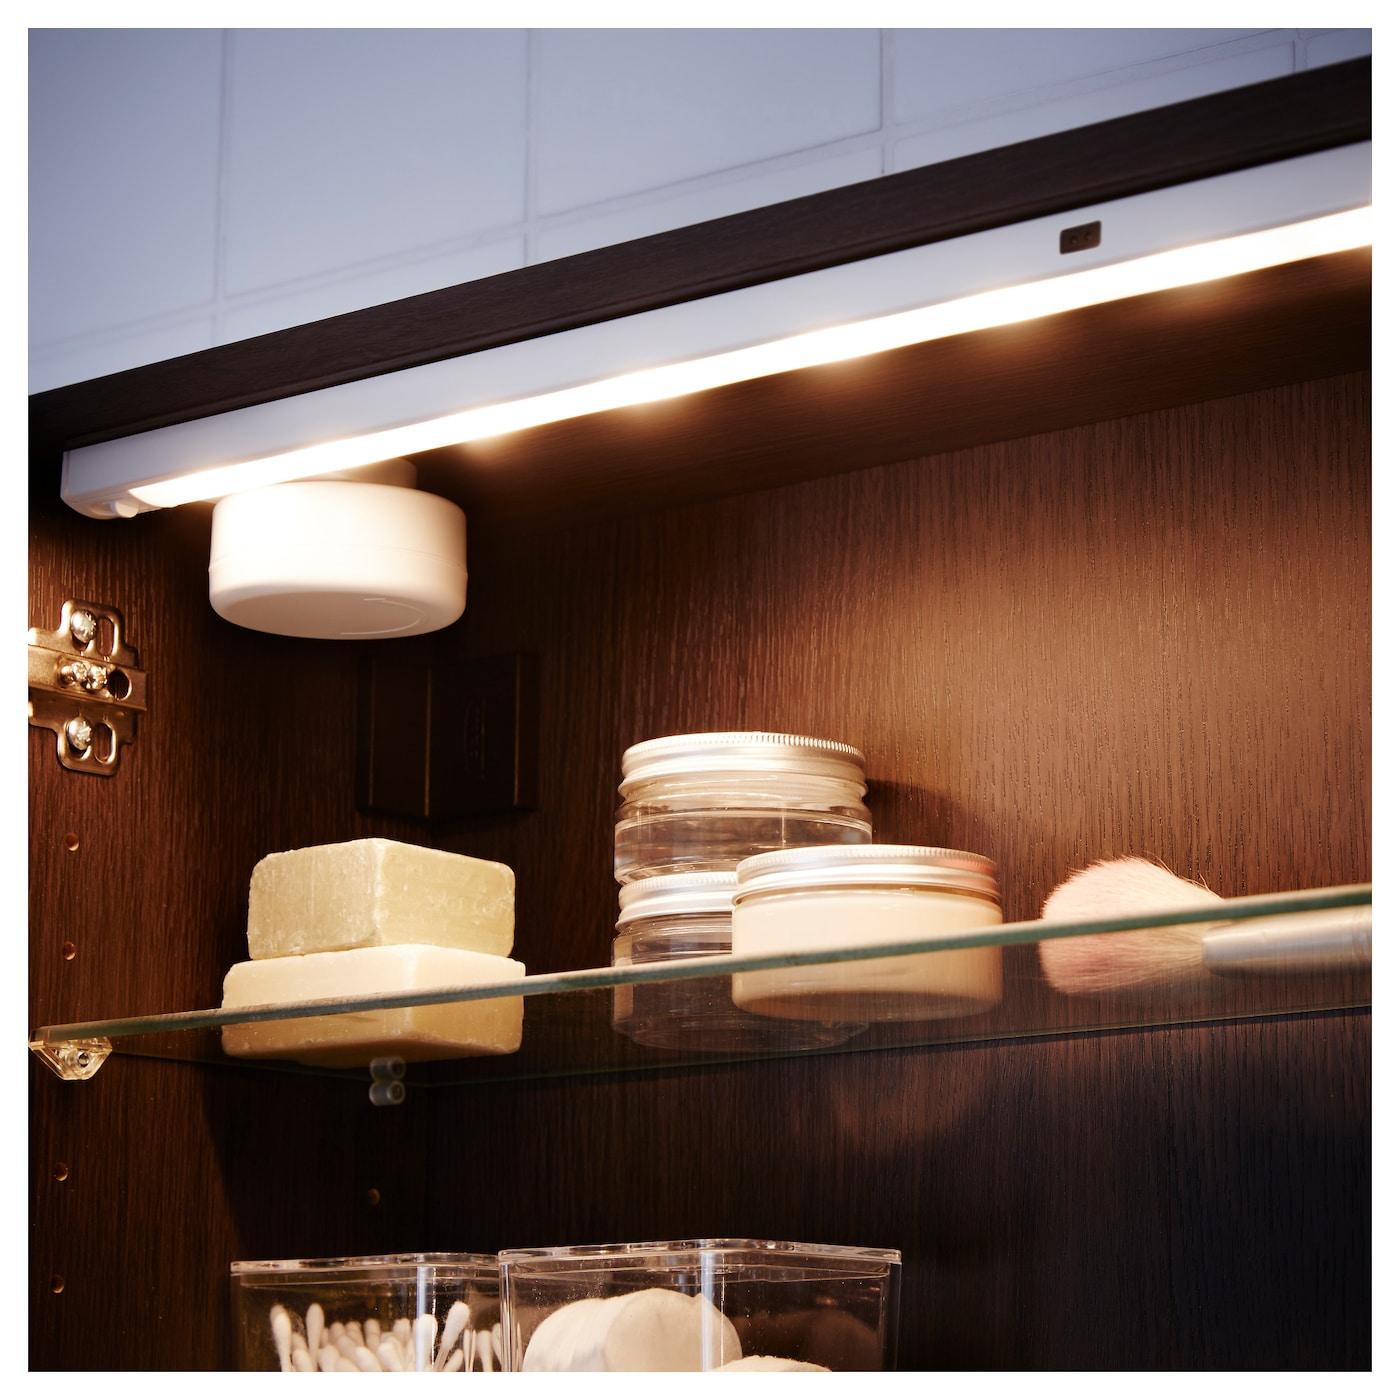 st tta baguette lumineuse led pile blanc 55 cm ikea. Black Bedroom Furniture Sets. Home Design Ideas